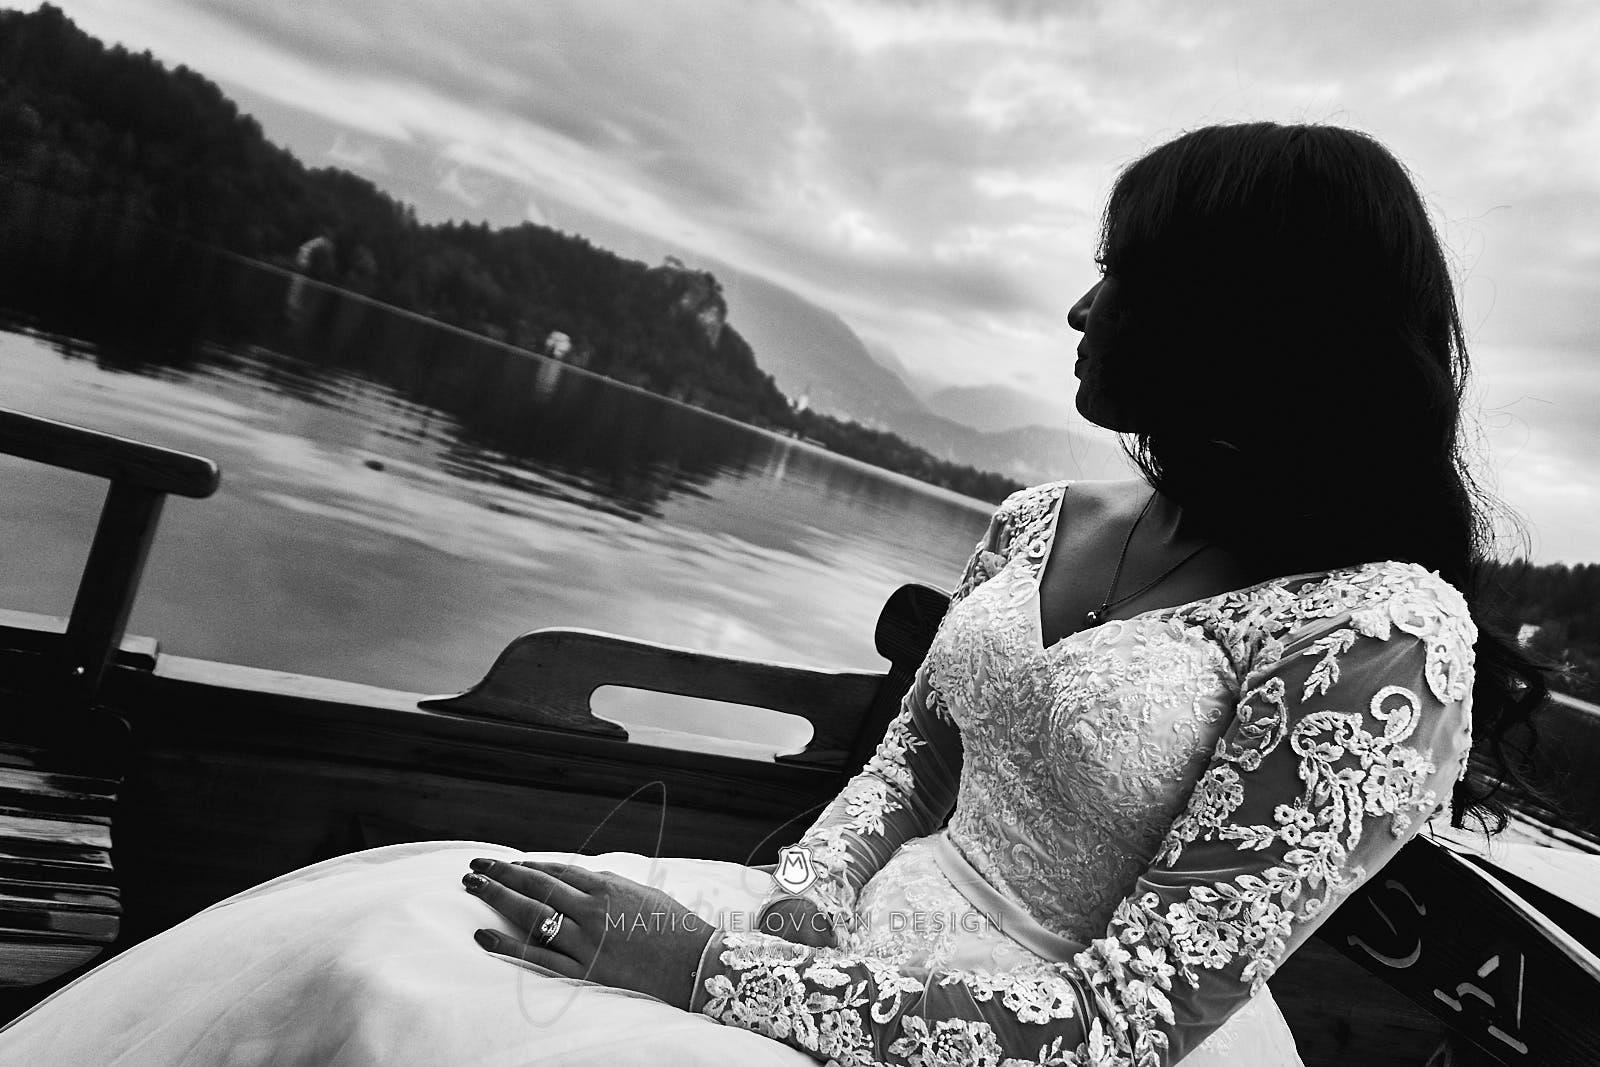 2017 09 29 18.35.12DSC08264 Web - Post-Wedding Photography